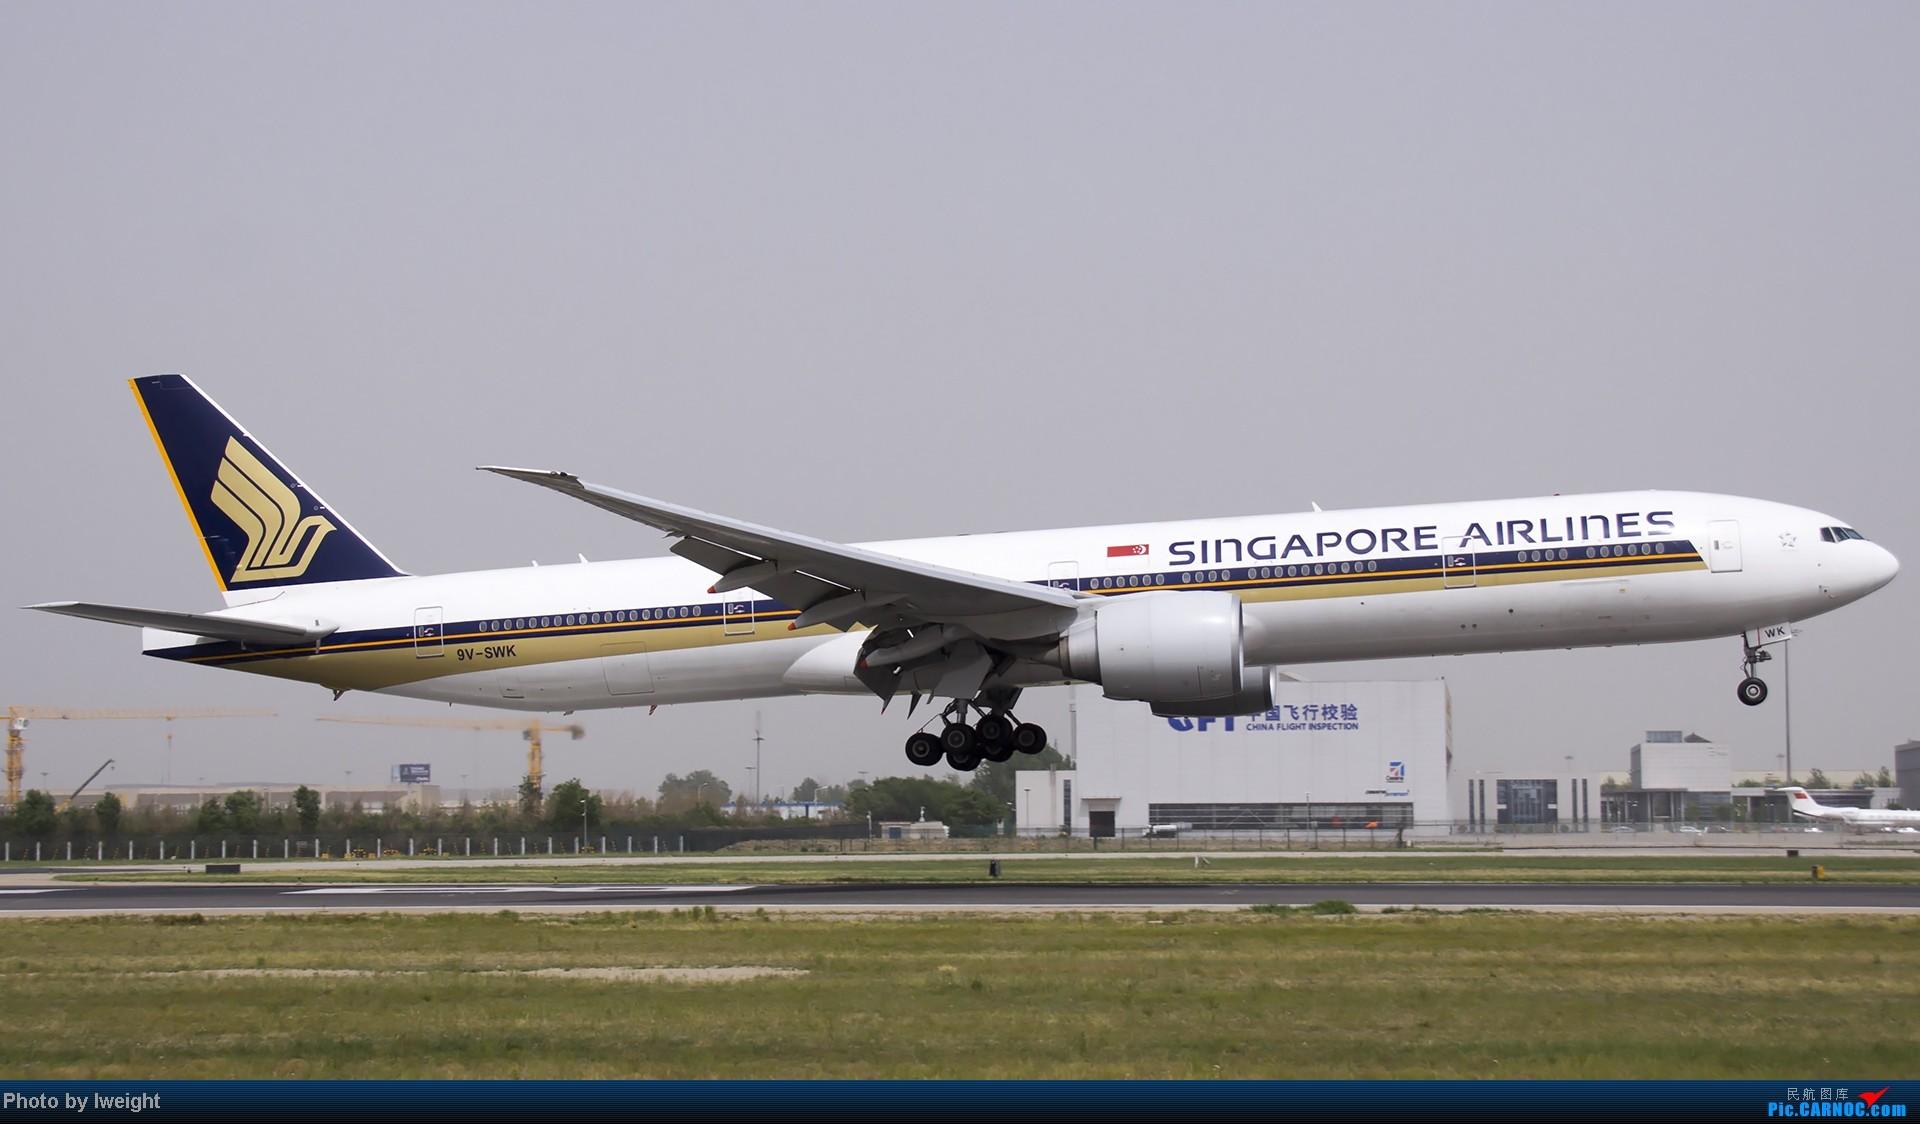 Re:[原创]霾天首都机场随拍 BOEING 777-300ER 9V-SWK 中国北京首都机场